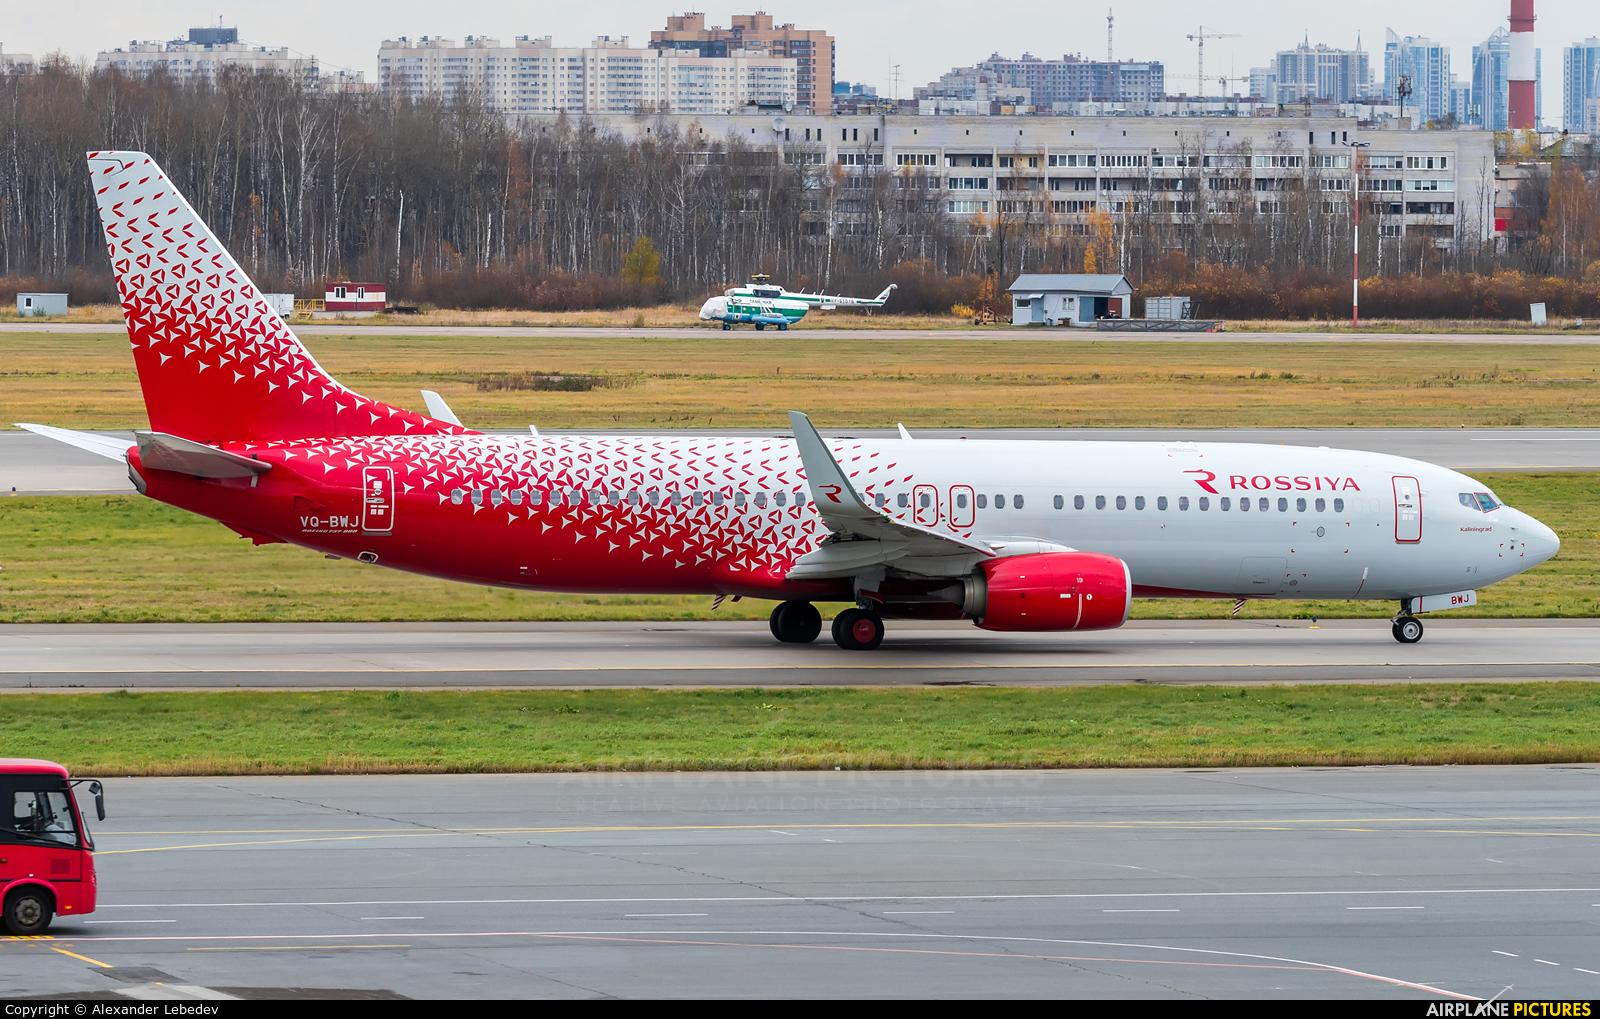 Rossiya VQ-BWJ aircraft at St. Petersburg - Pulkovo